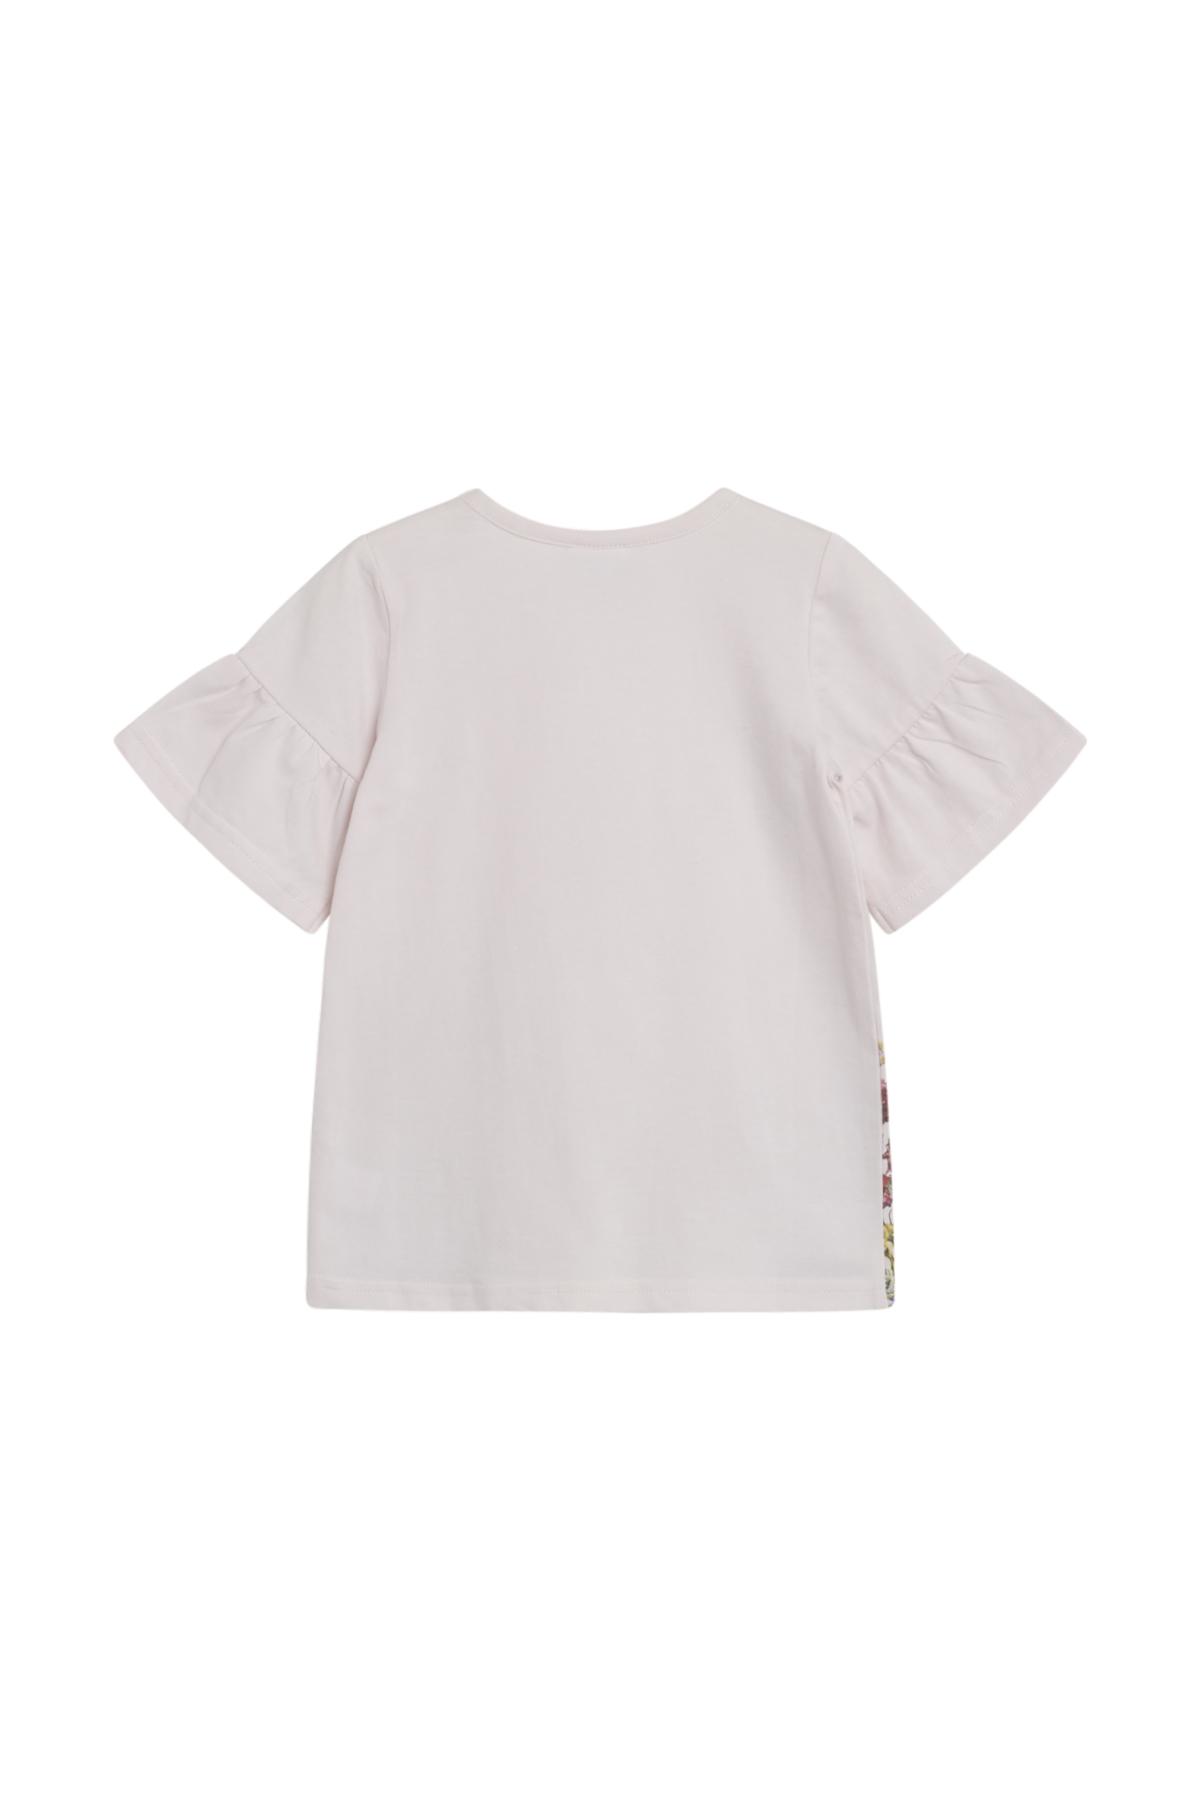 Hust and Claire Alandra t-shirt, Skin chalk, 110